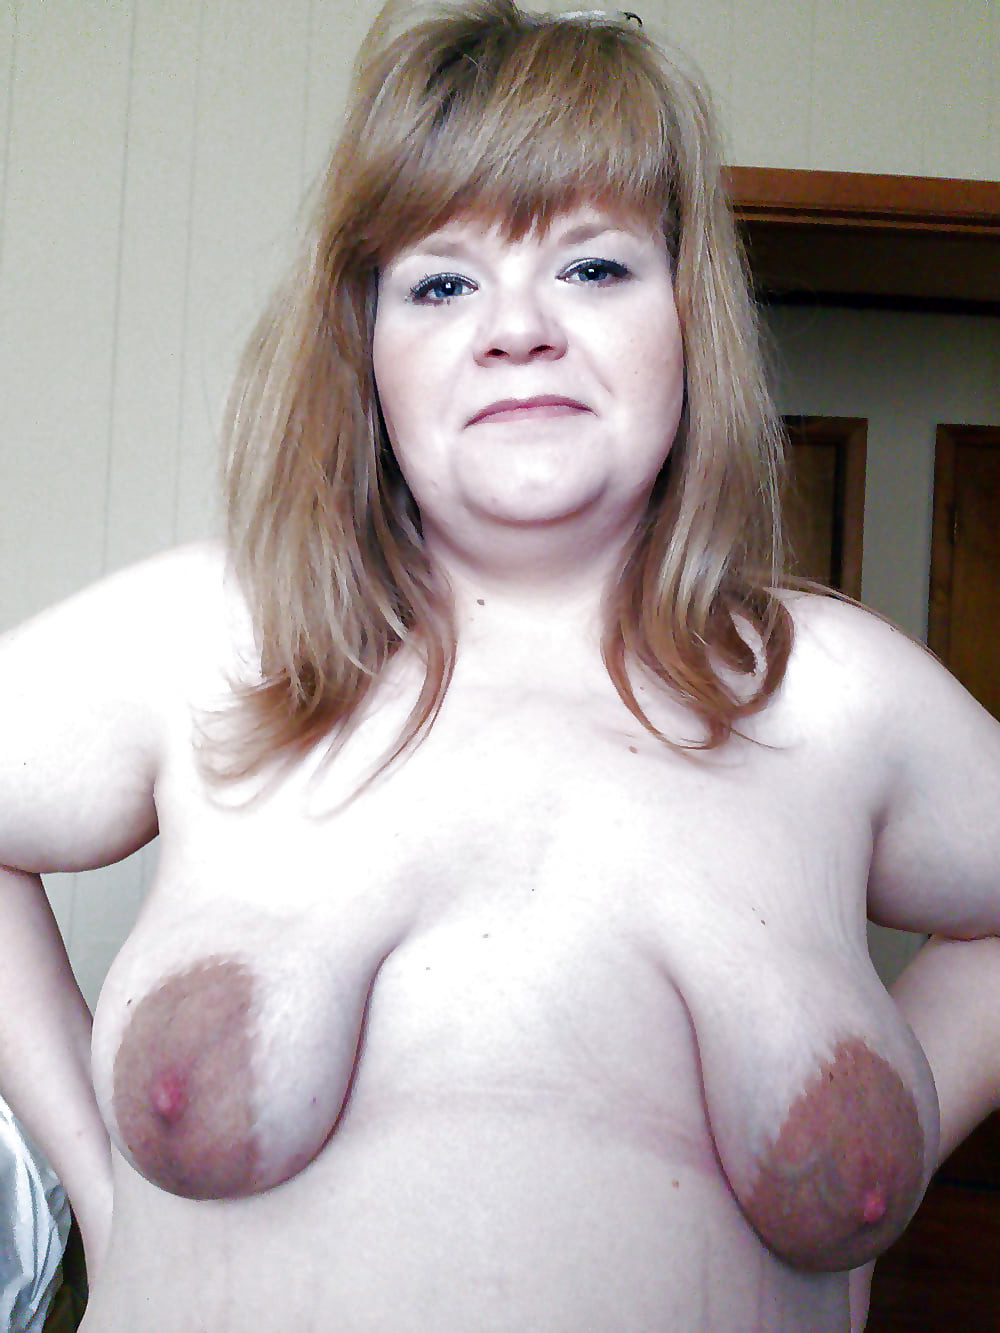 Milf Boobs Bbw - Milf big boobs bbw pics - Naked Mature Photos.com